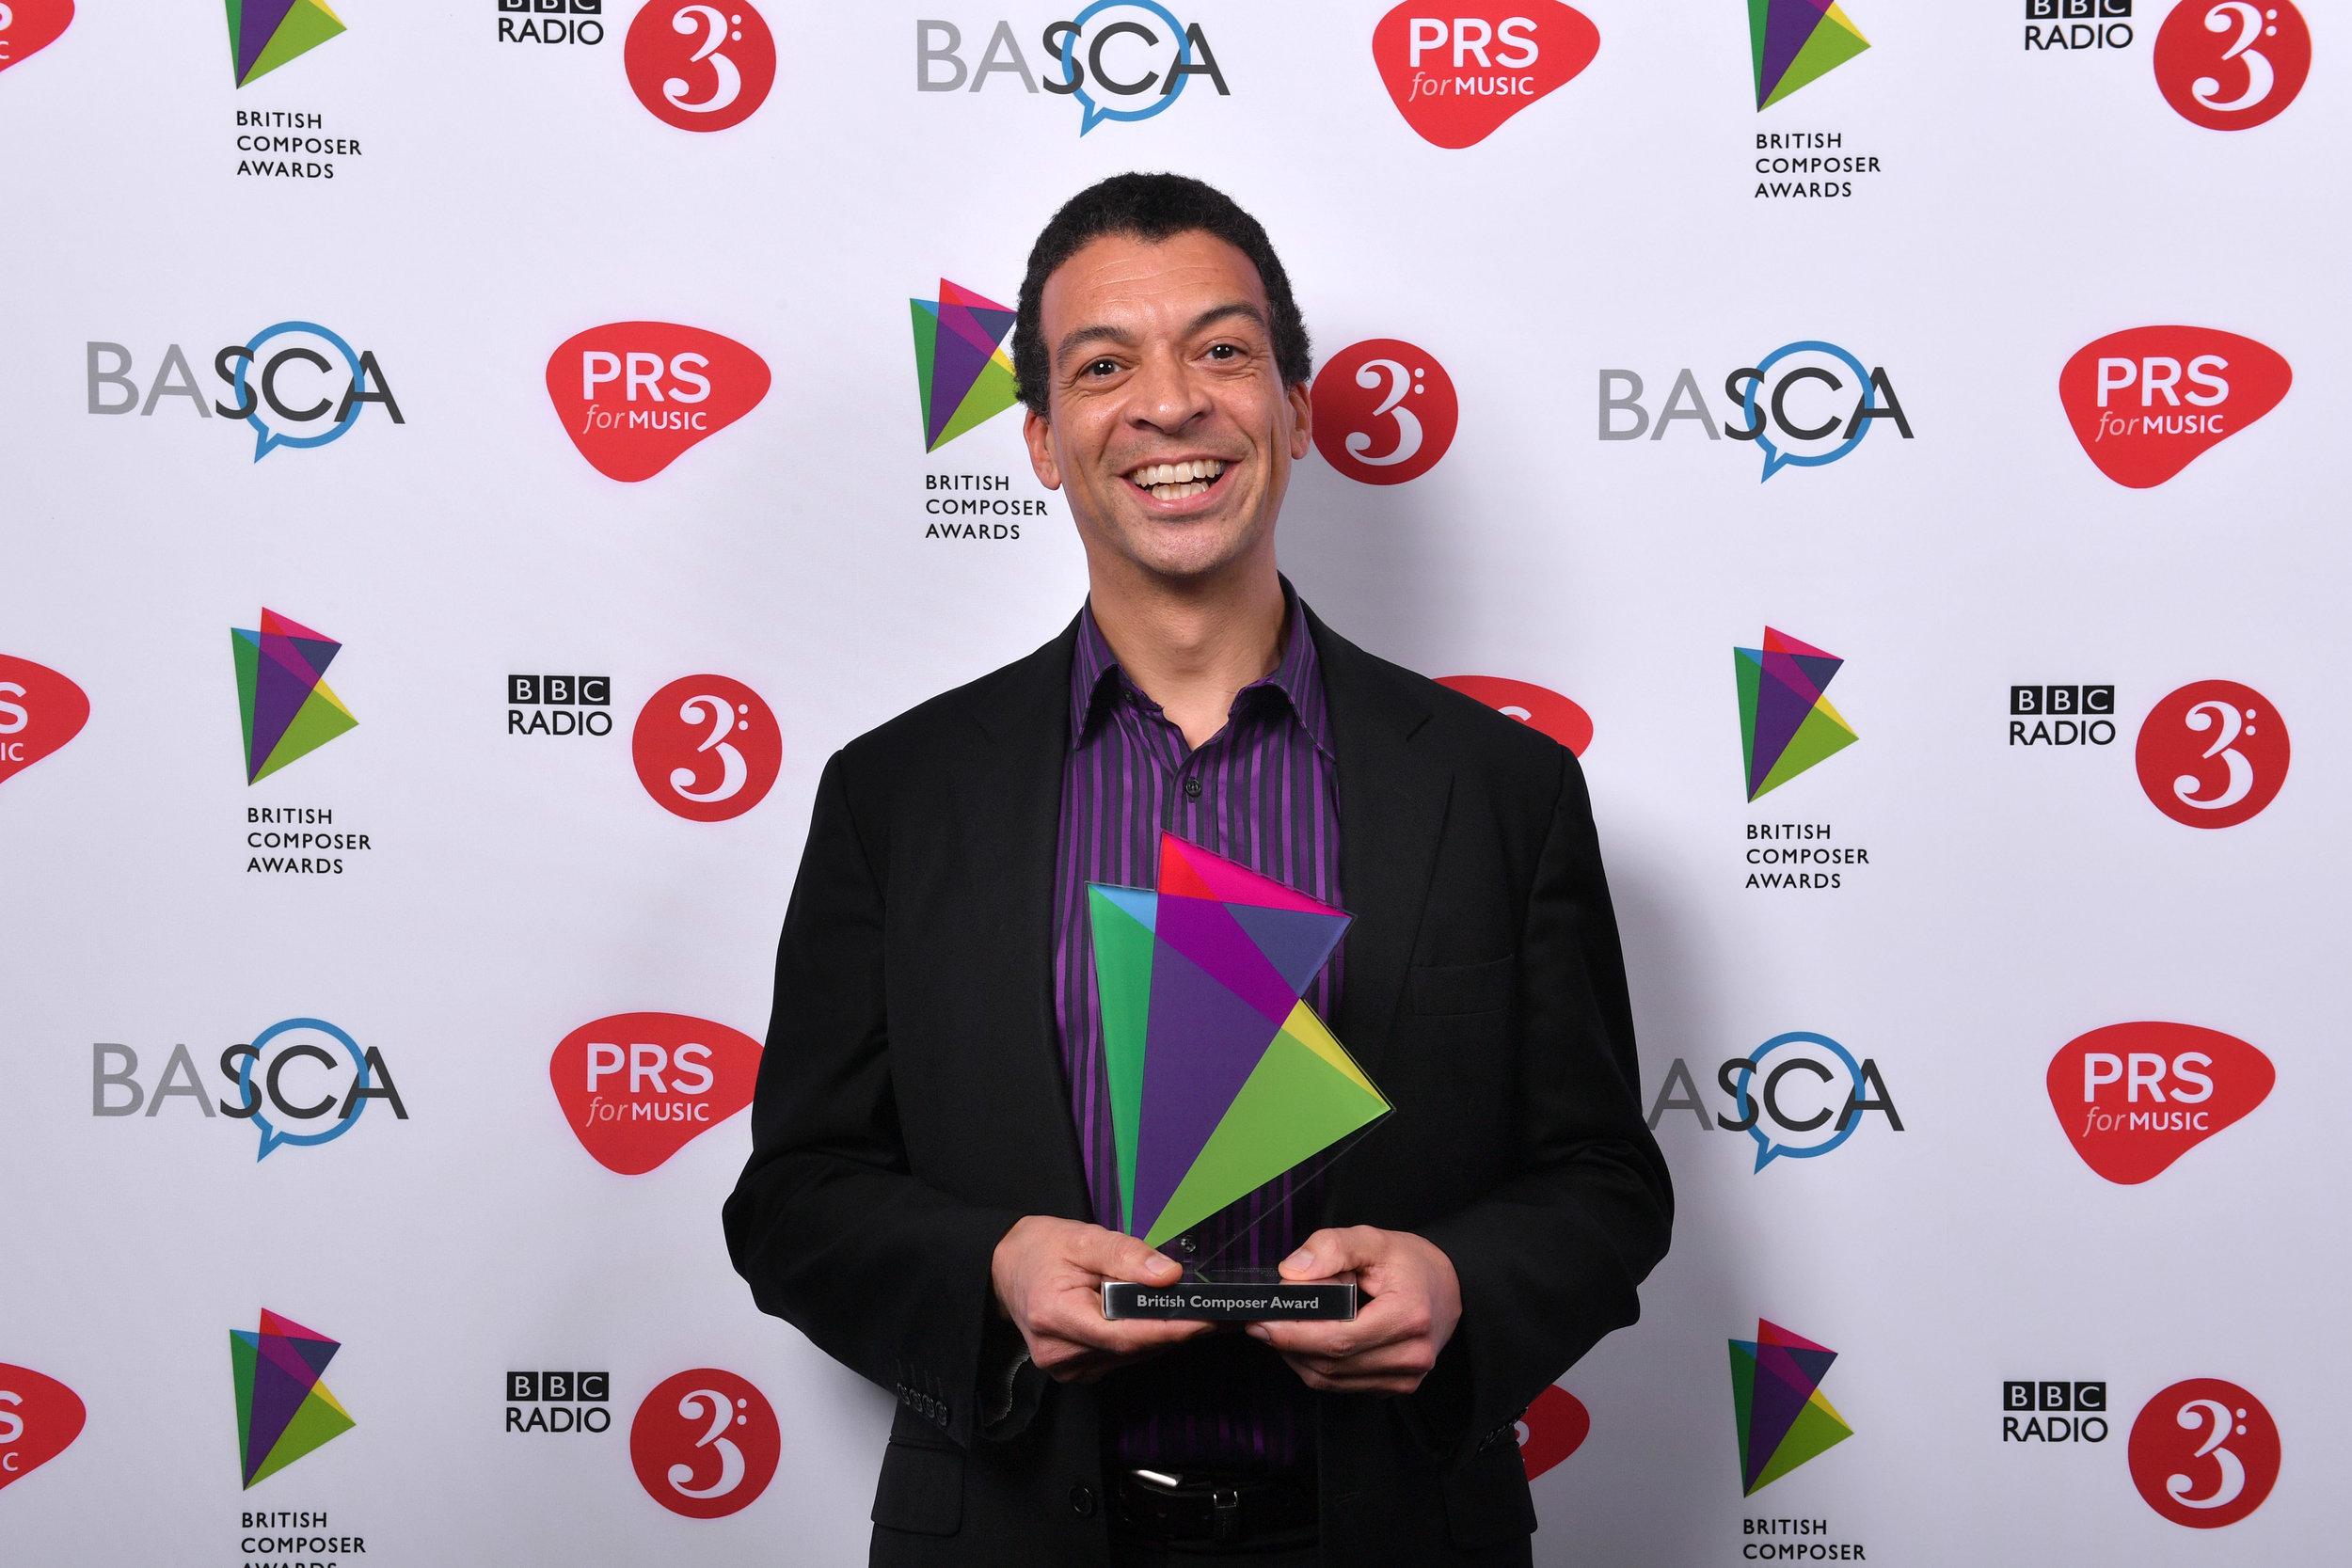 Choral_Roderick-Williams_British-Composer-Awards-2016_photo-Mark-Allan-3.jpg